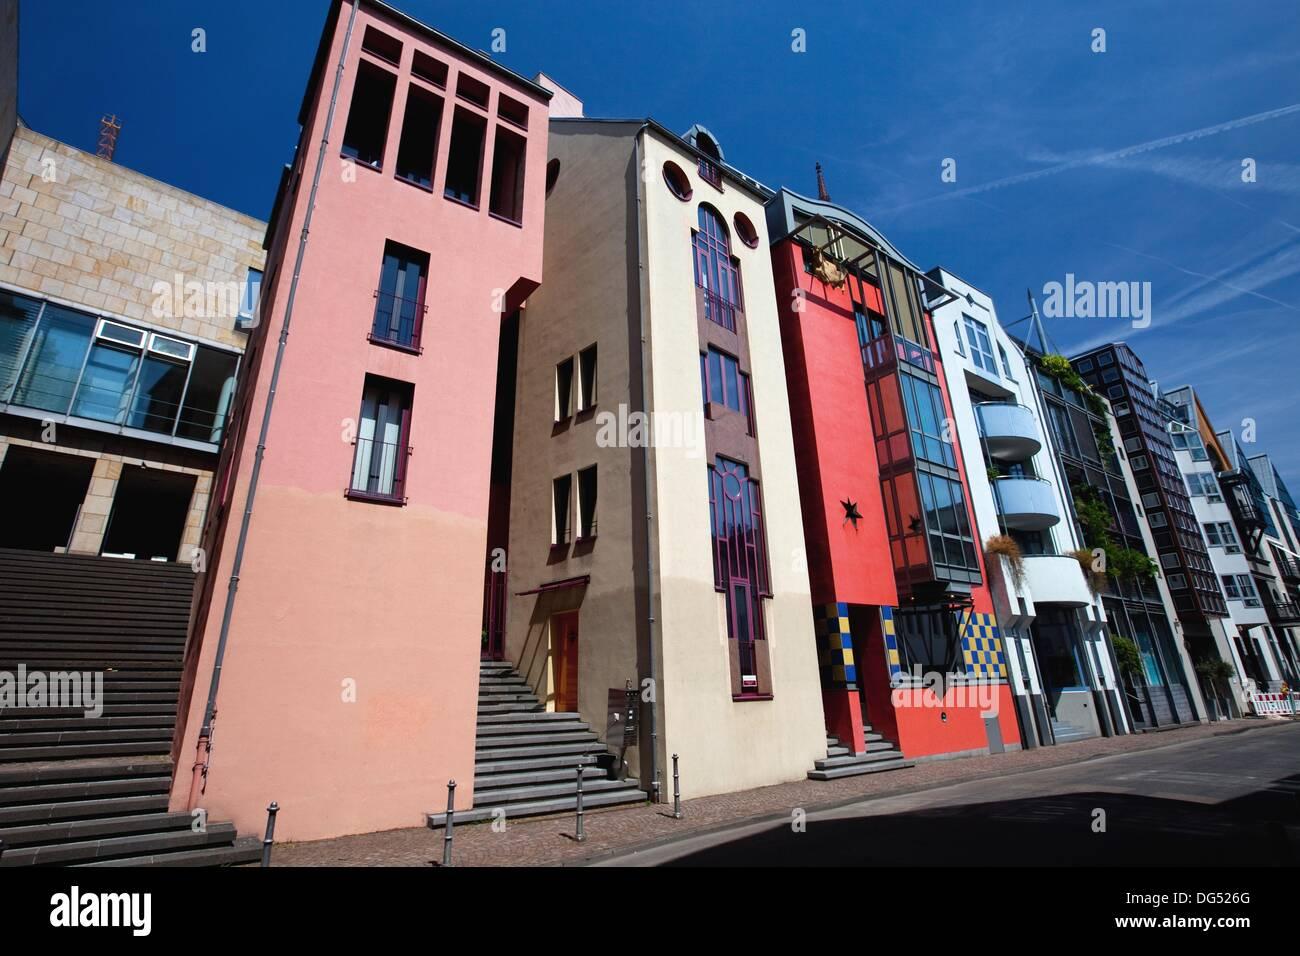 Moderne Häuser entlang der Saalgasse Straße in Frankfurt Am Main ...